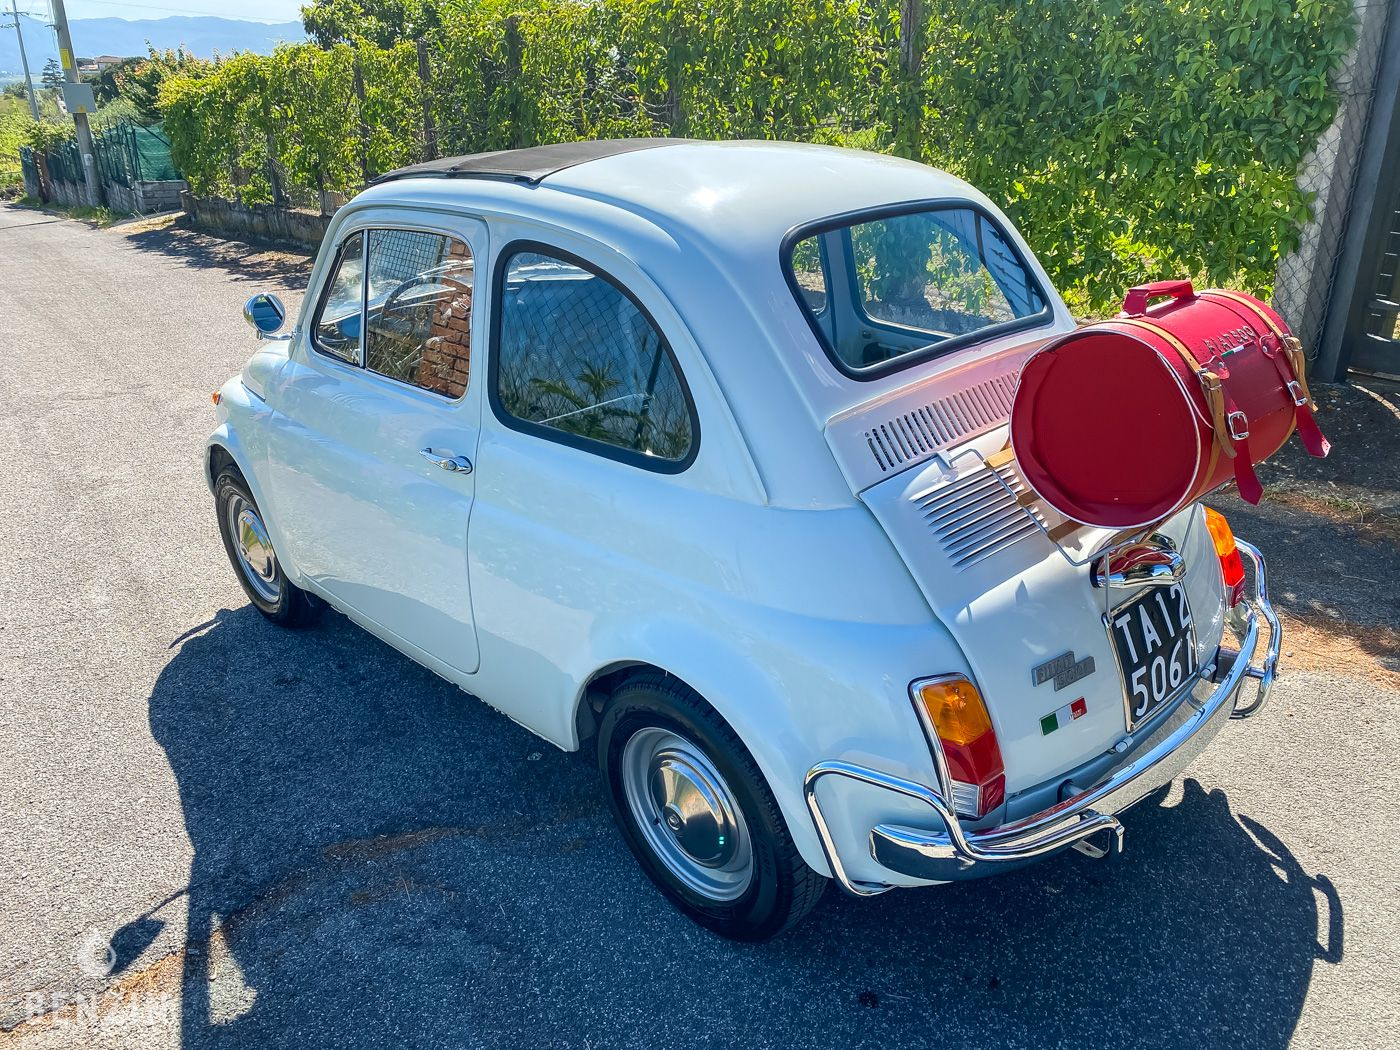 Fiat 500 a vendre/ Fiat 500 to sell/ Fiat 500 verkaufen/ Fiat 500 en venta